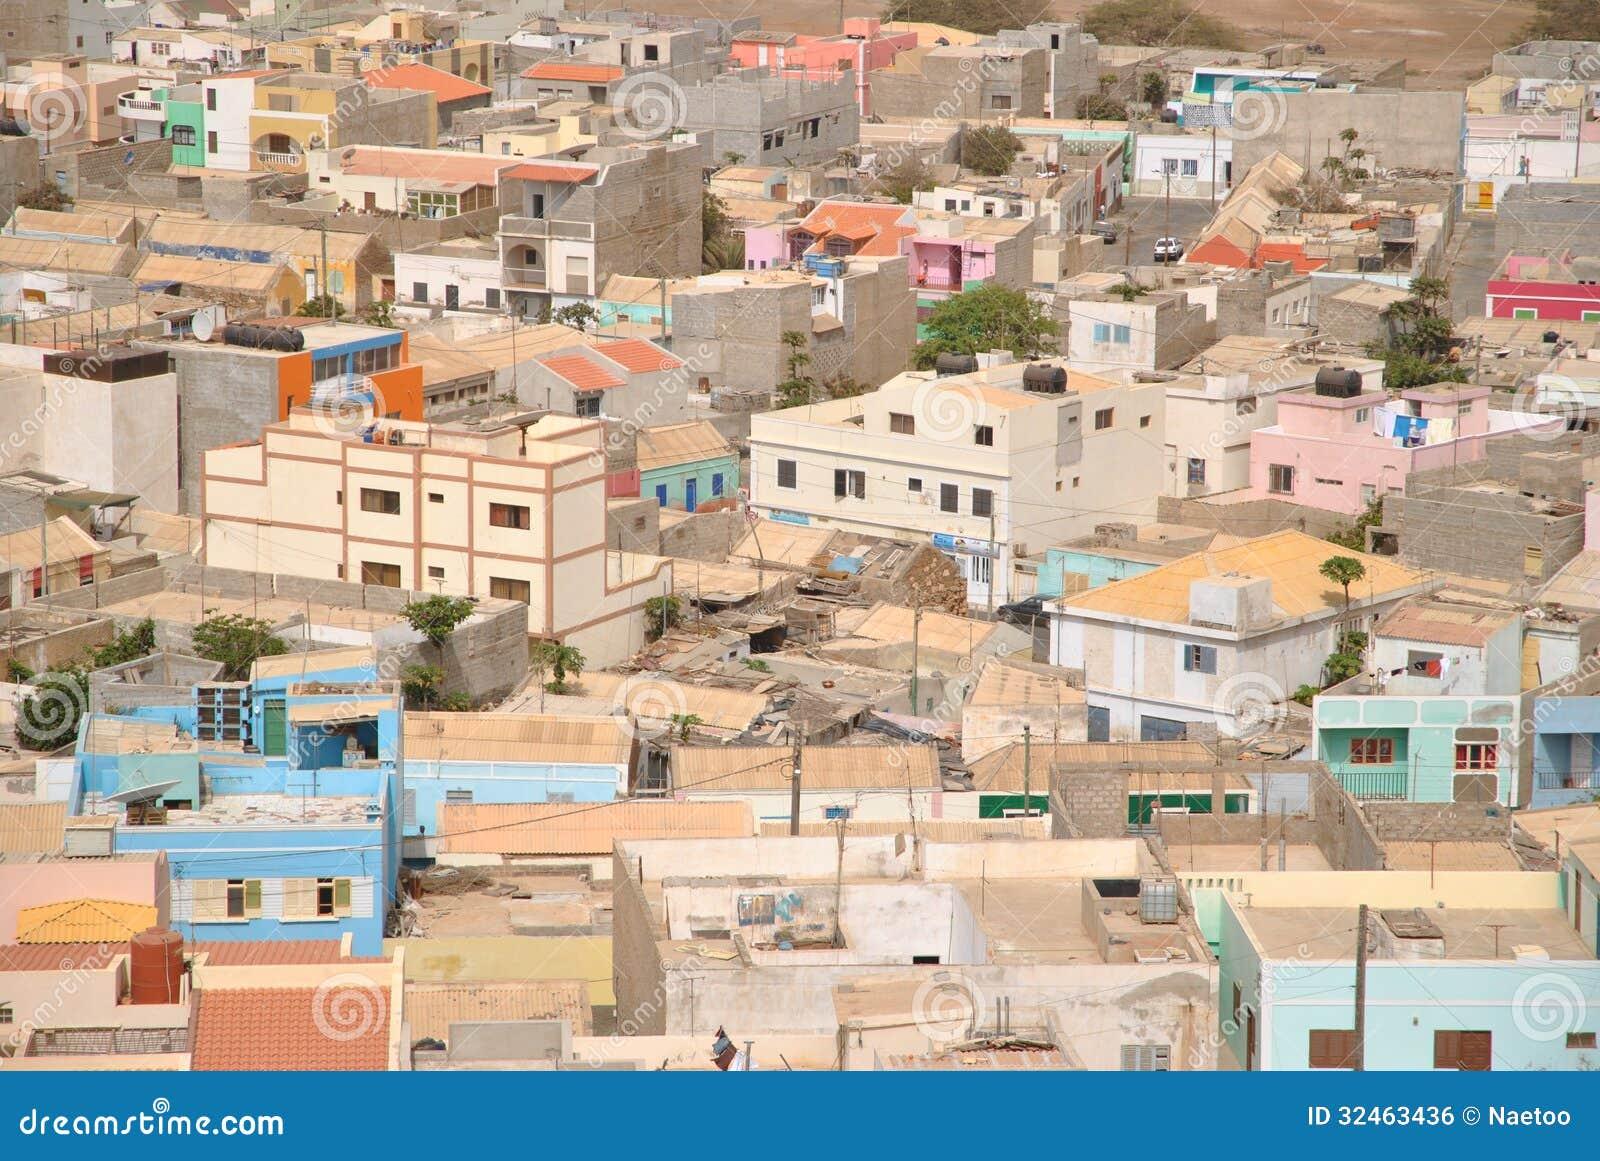 Espargos Capital City Of Island Sal Cabo Verde Royalty Free Stock Image Image 32463436